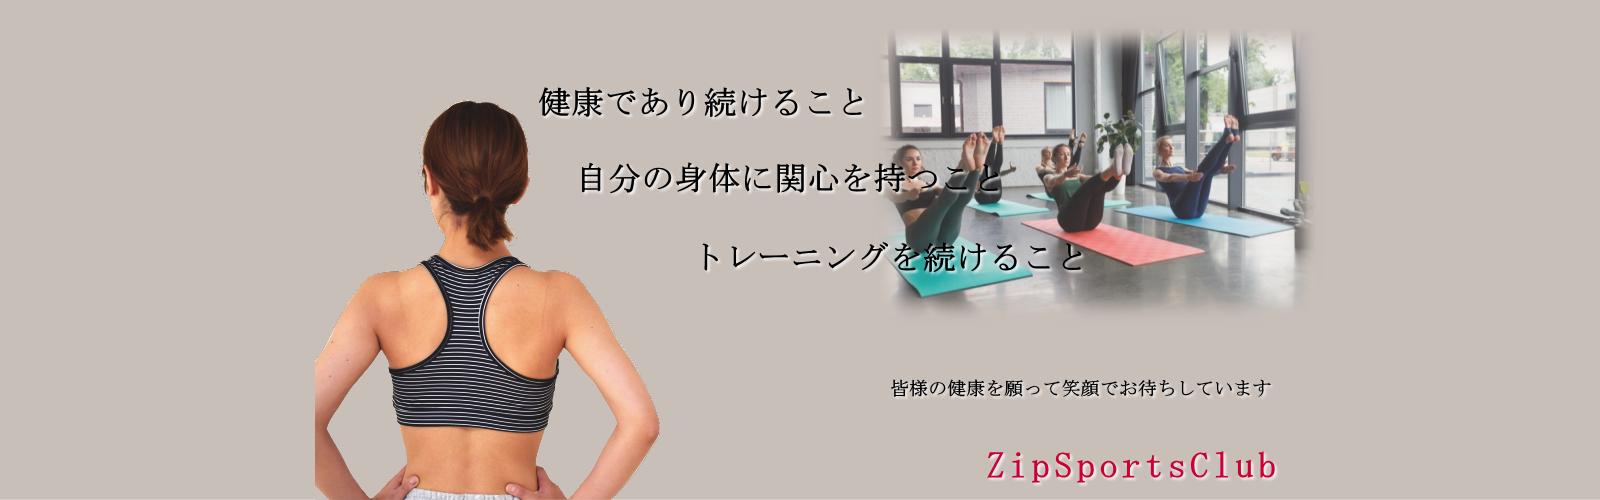 ZiPスポーツクラブの画像